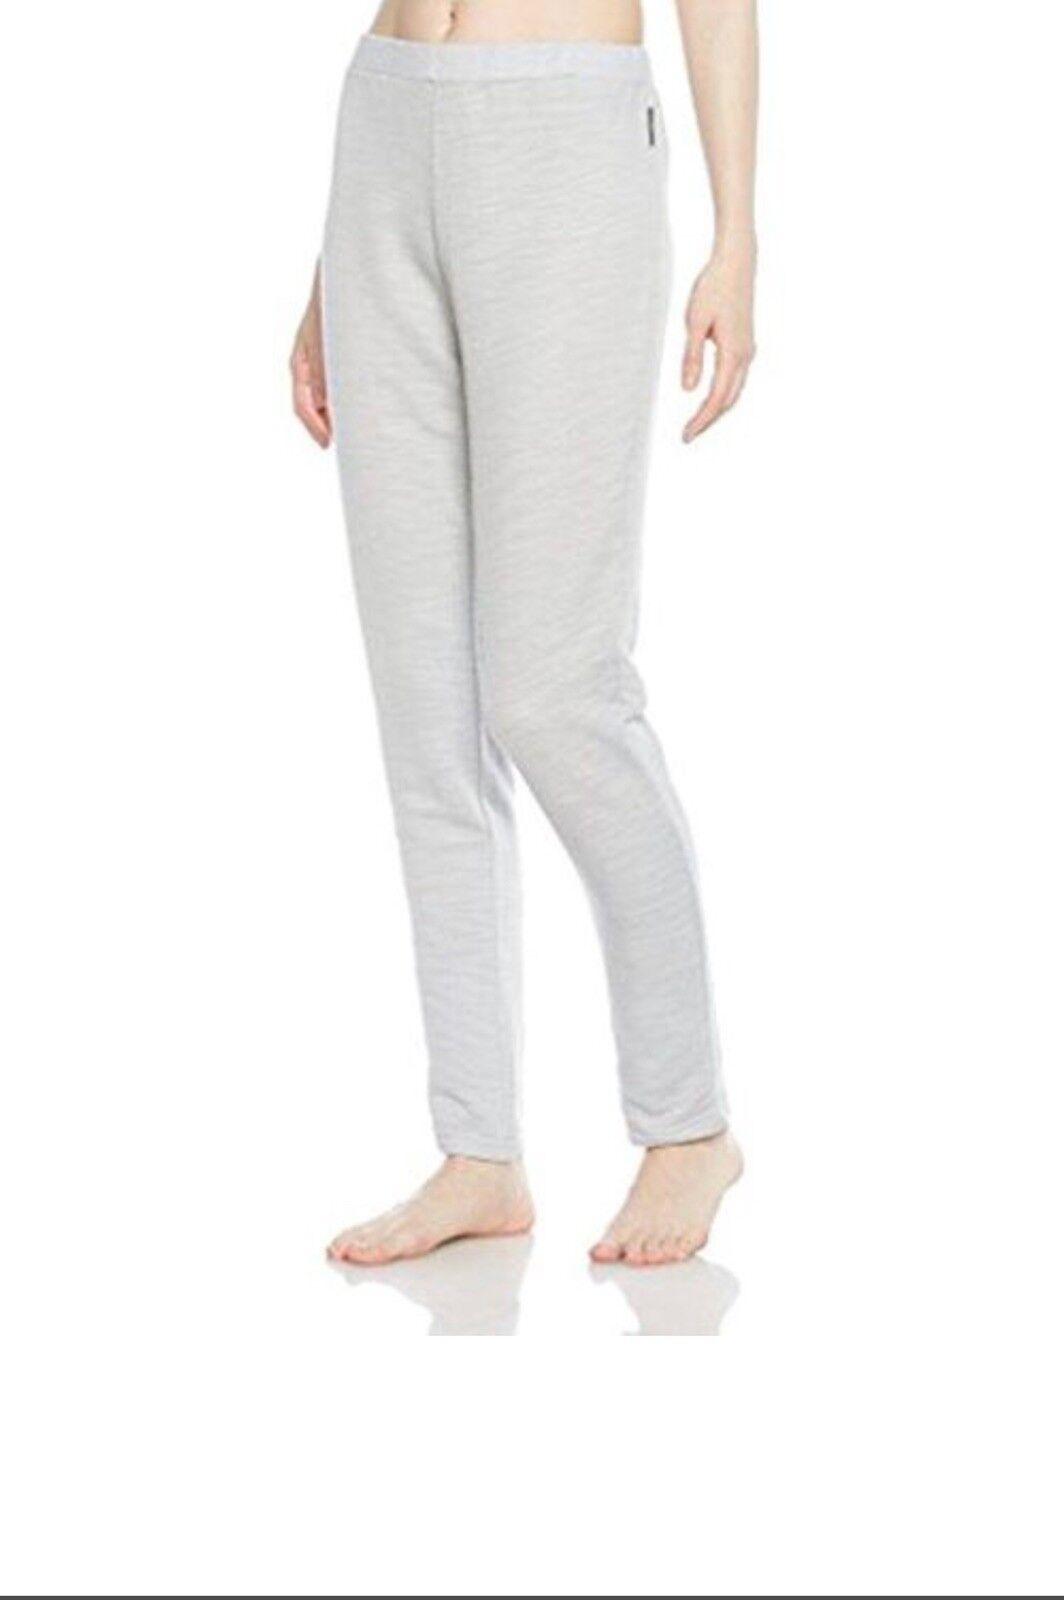 Emporio Armani  damen's  Melange Lounge Pants  NWTGröße medium